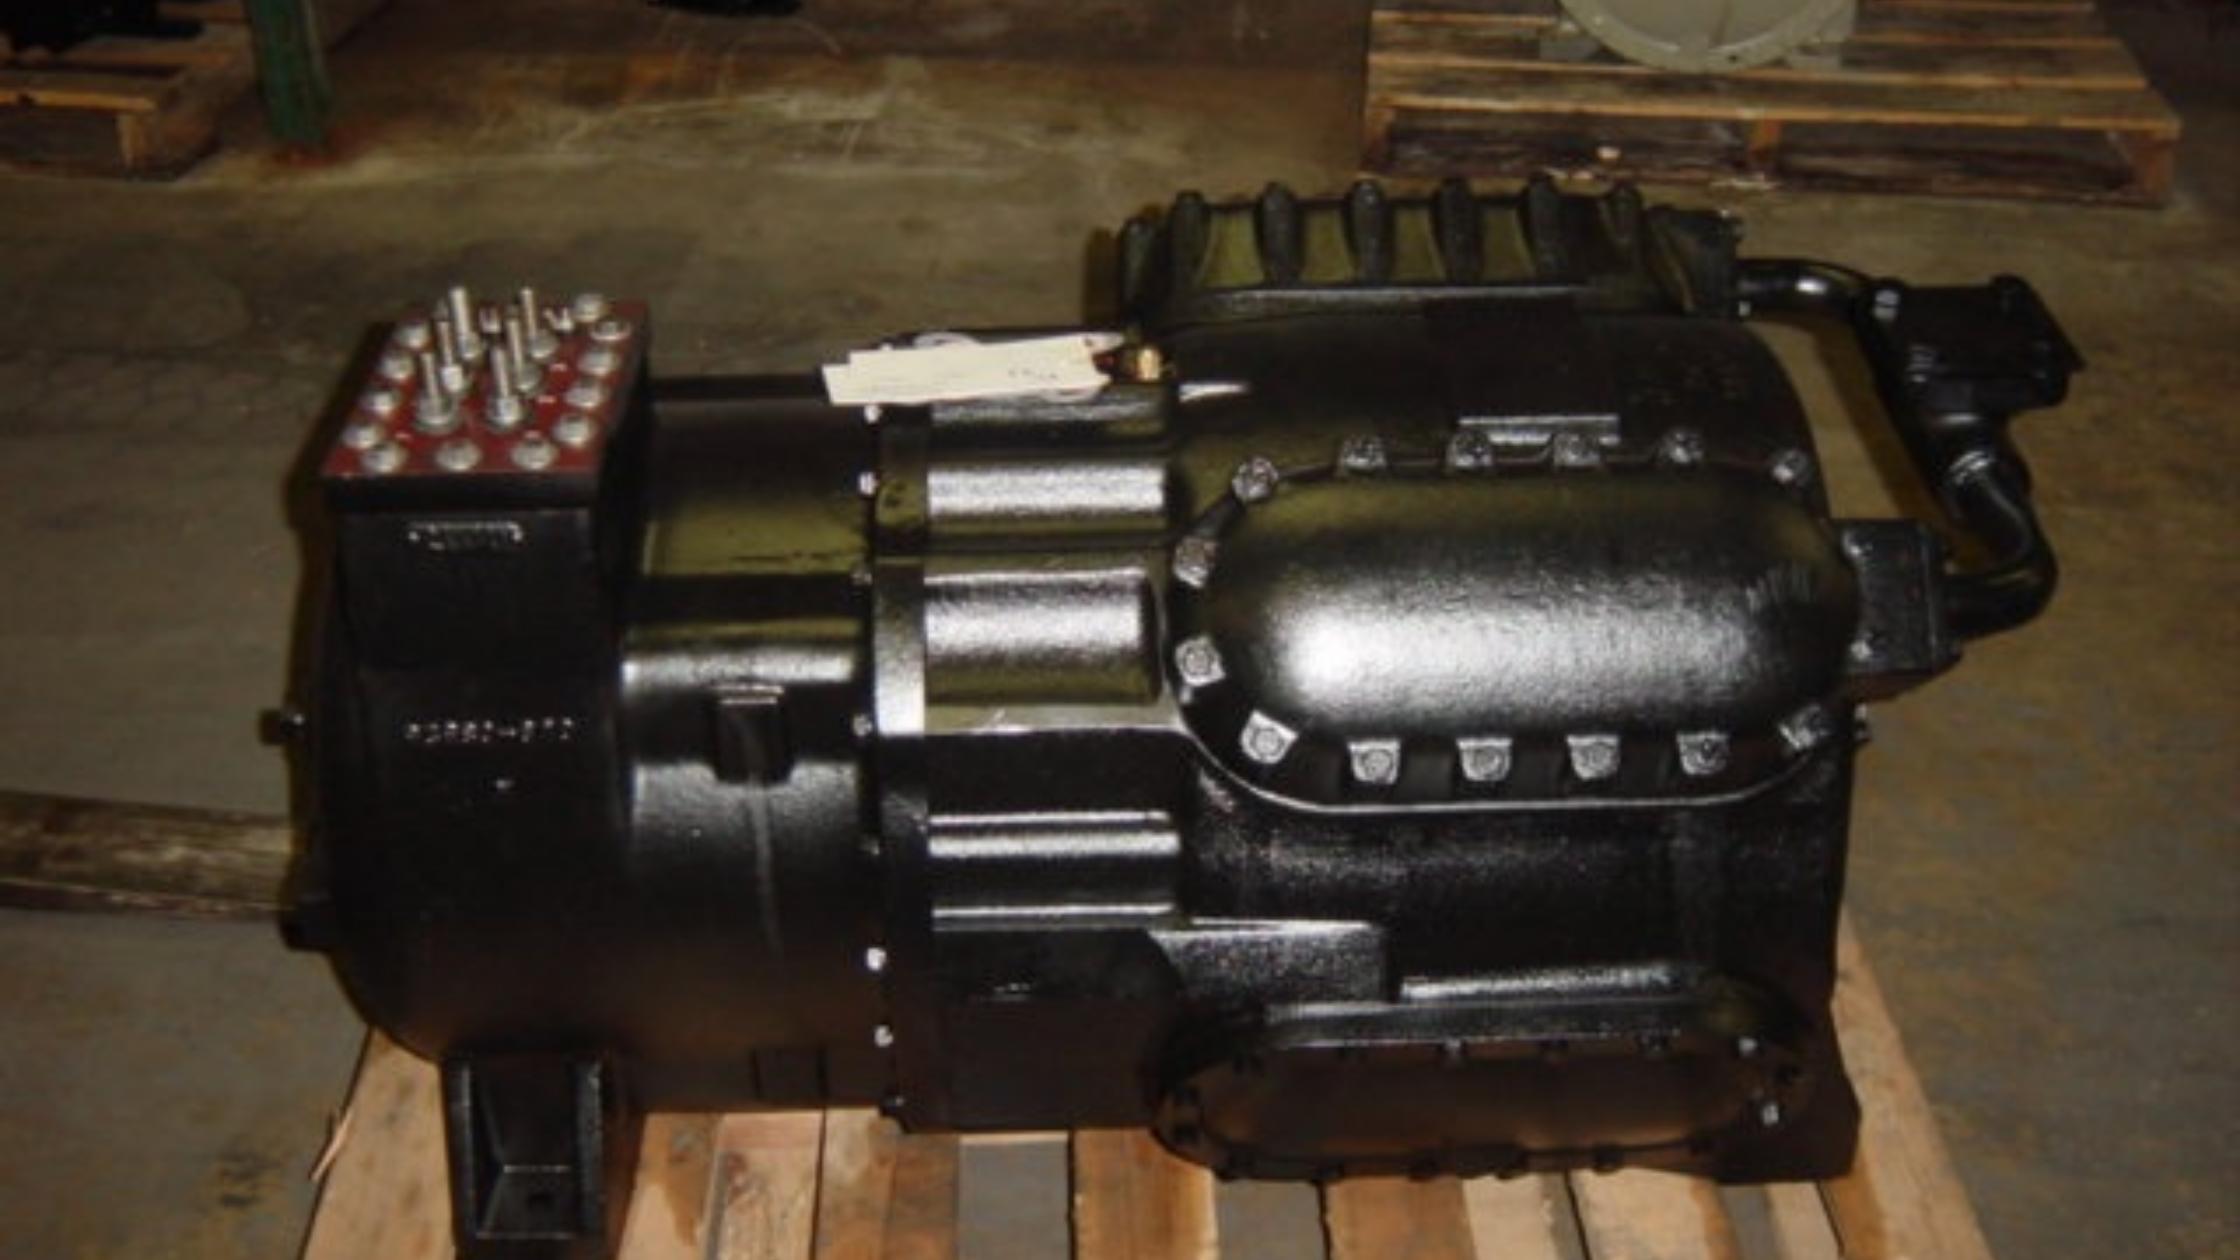 York JS43 Compressor